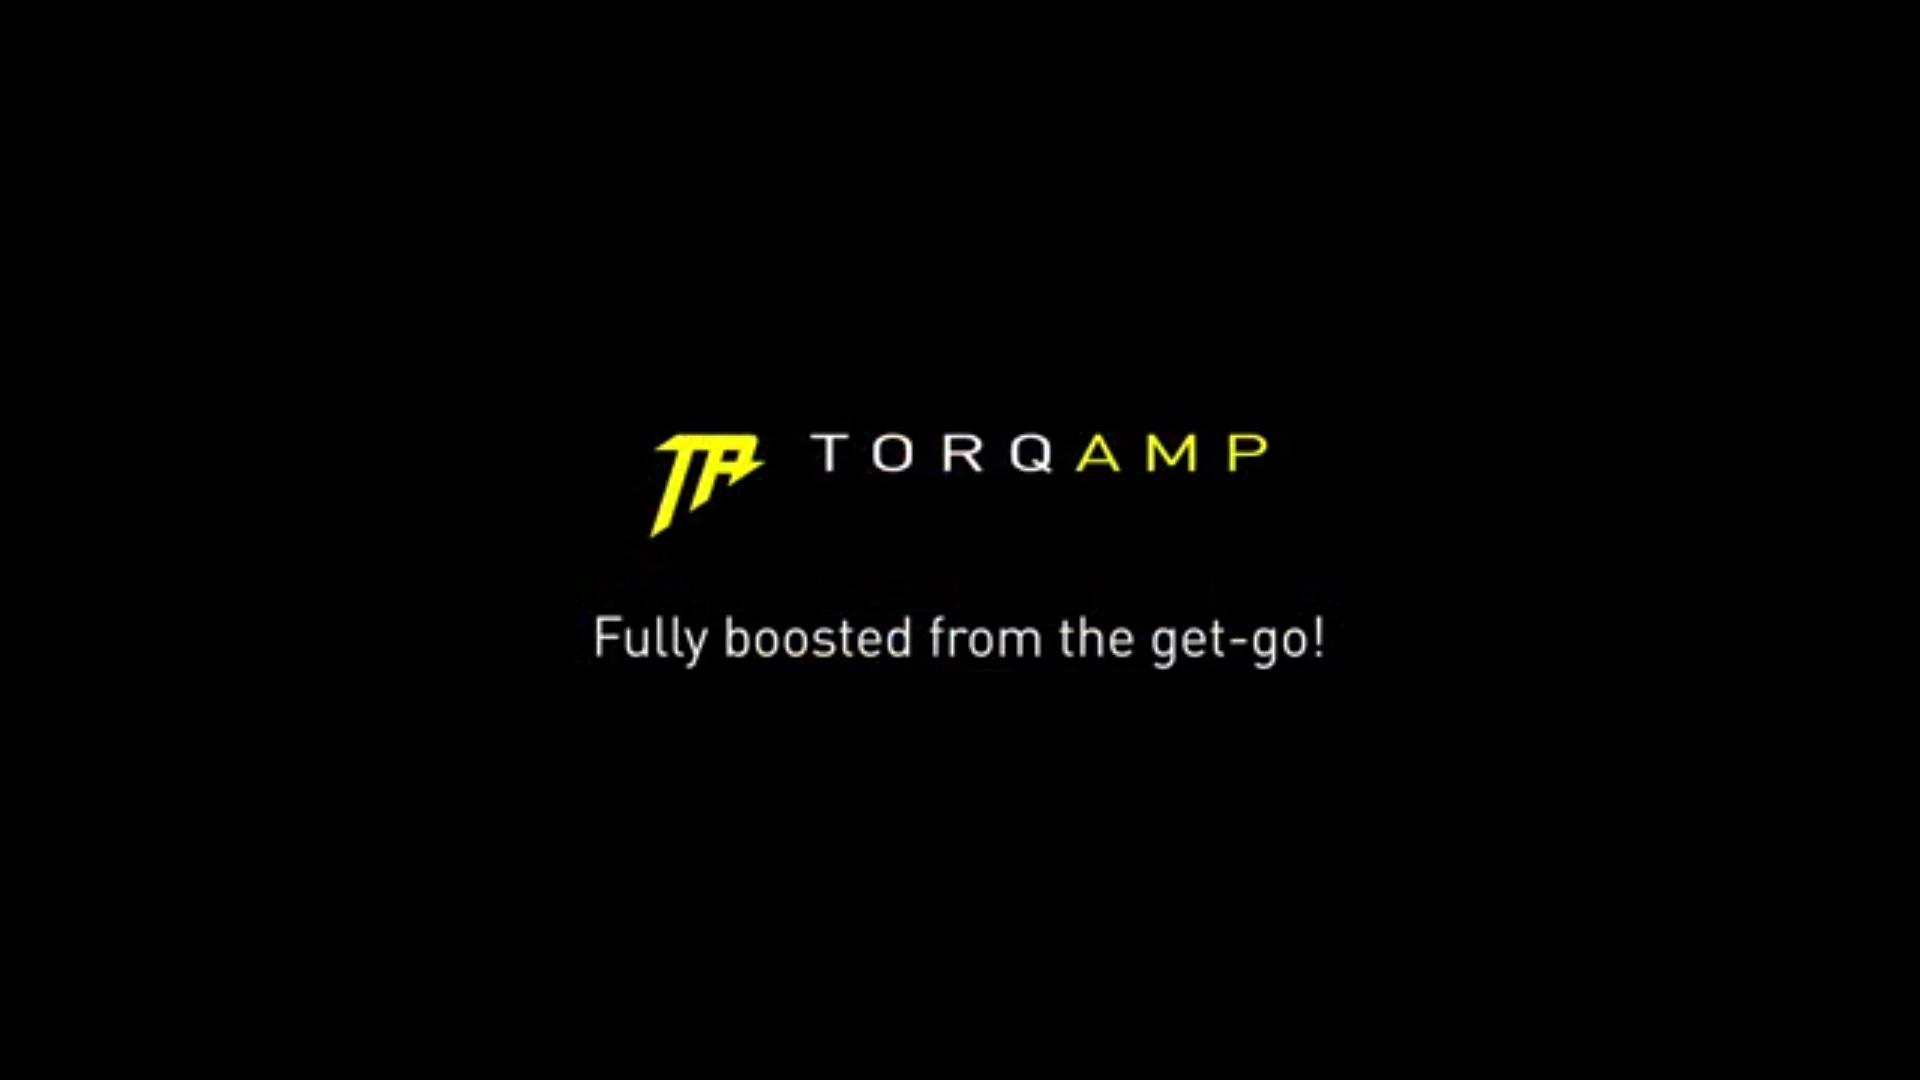 TorqAmp_slogan